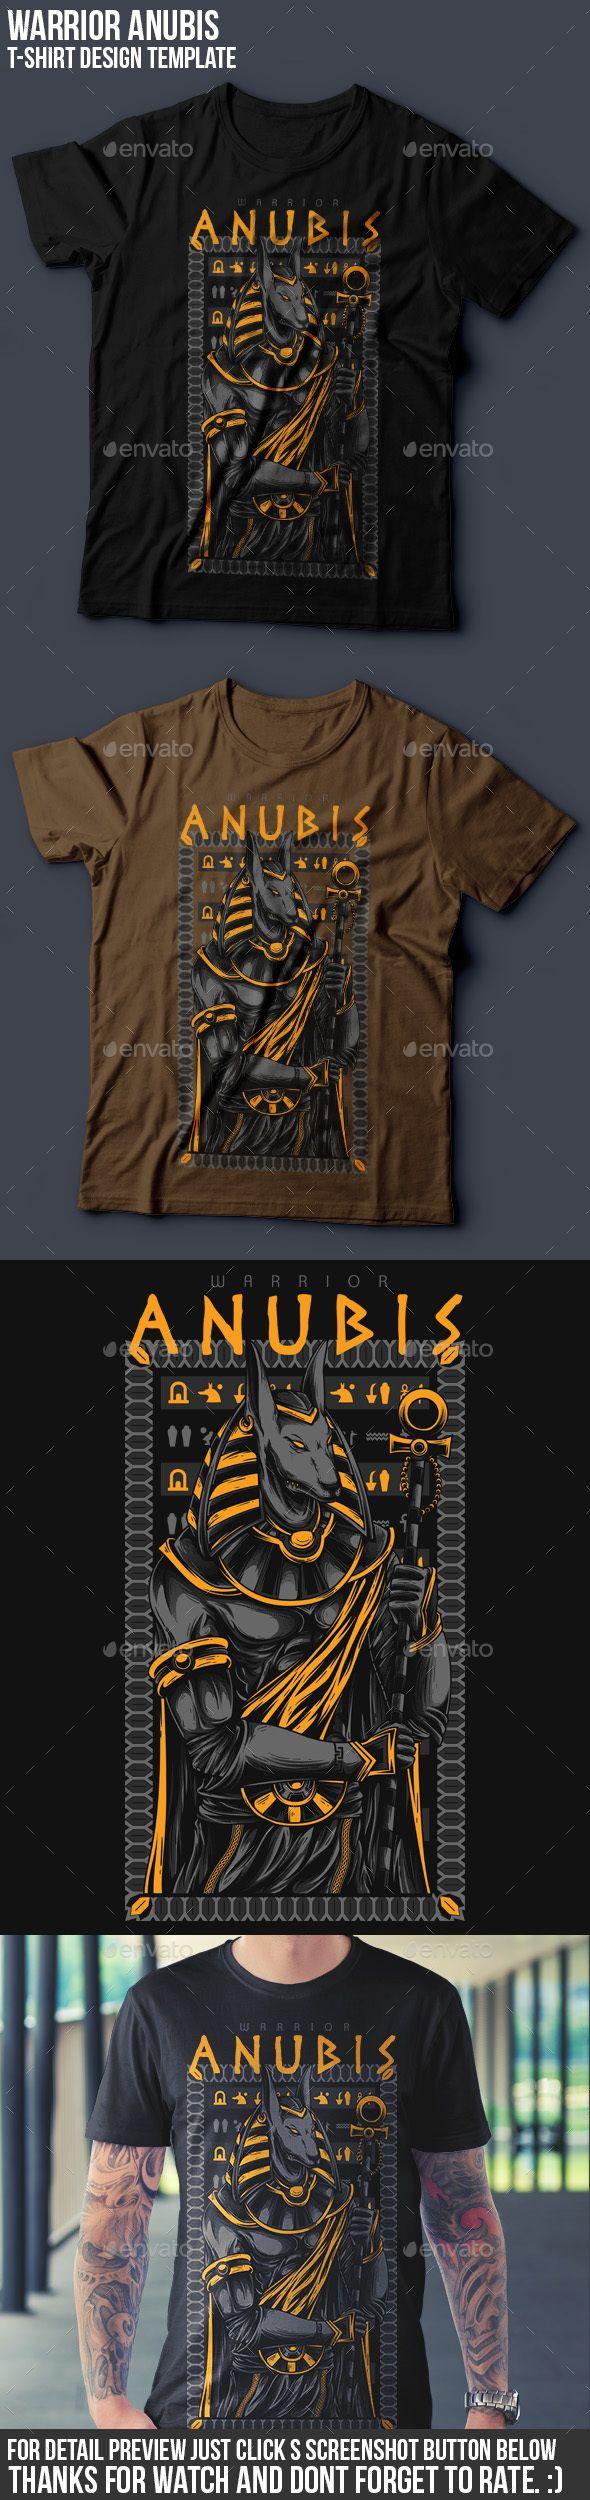 Shirt design illustrator template - Anubis Warrior T Shirt Design